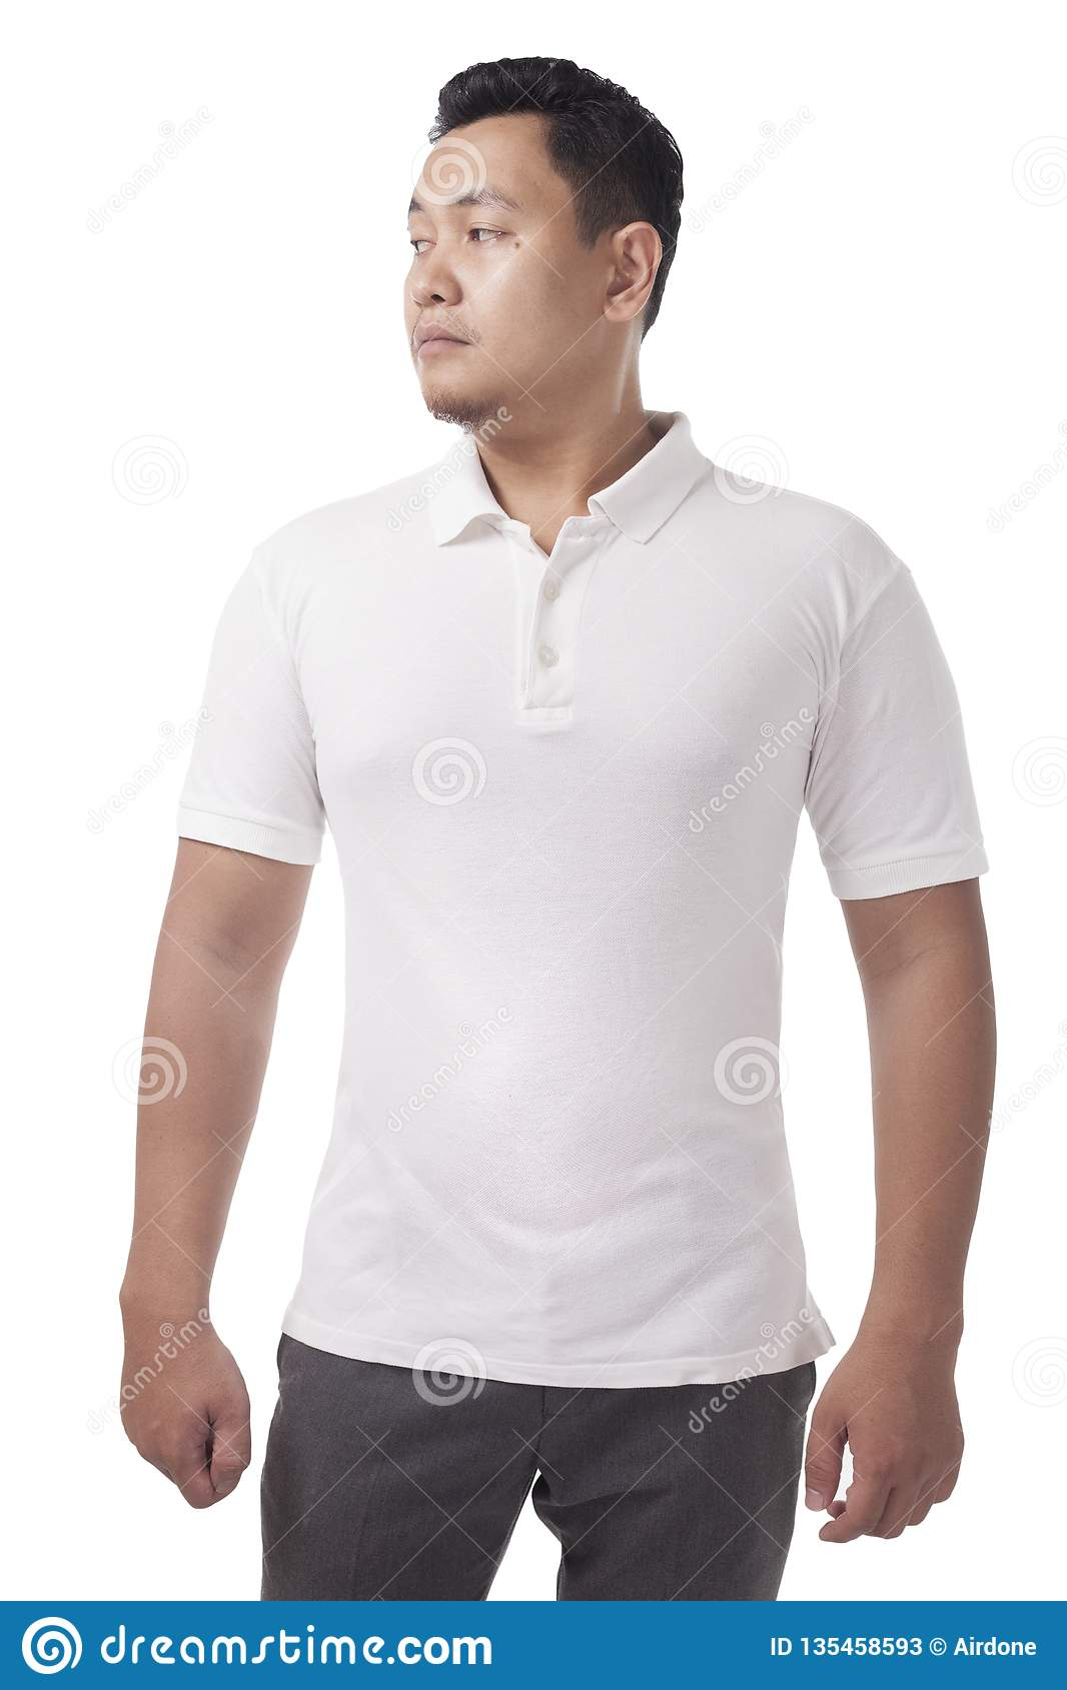 Polo Shirt Template Mock Up Stock Image Image Of Model